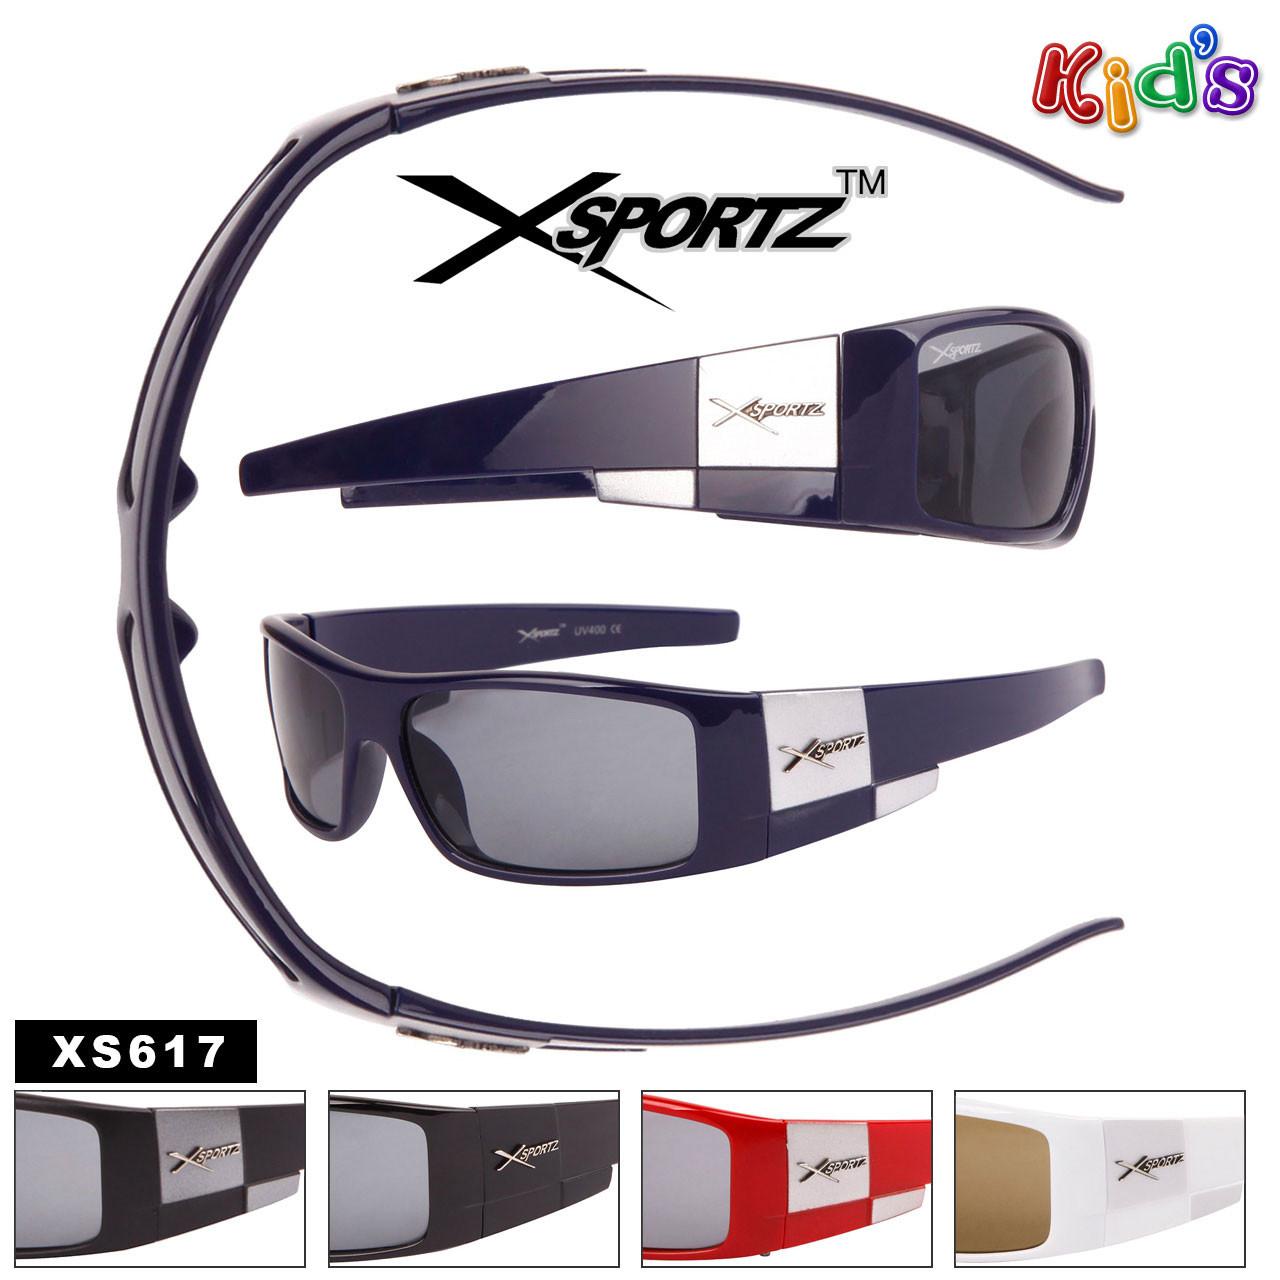 Xsportz Kids Sunglasses Assorted Colors - XS617